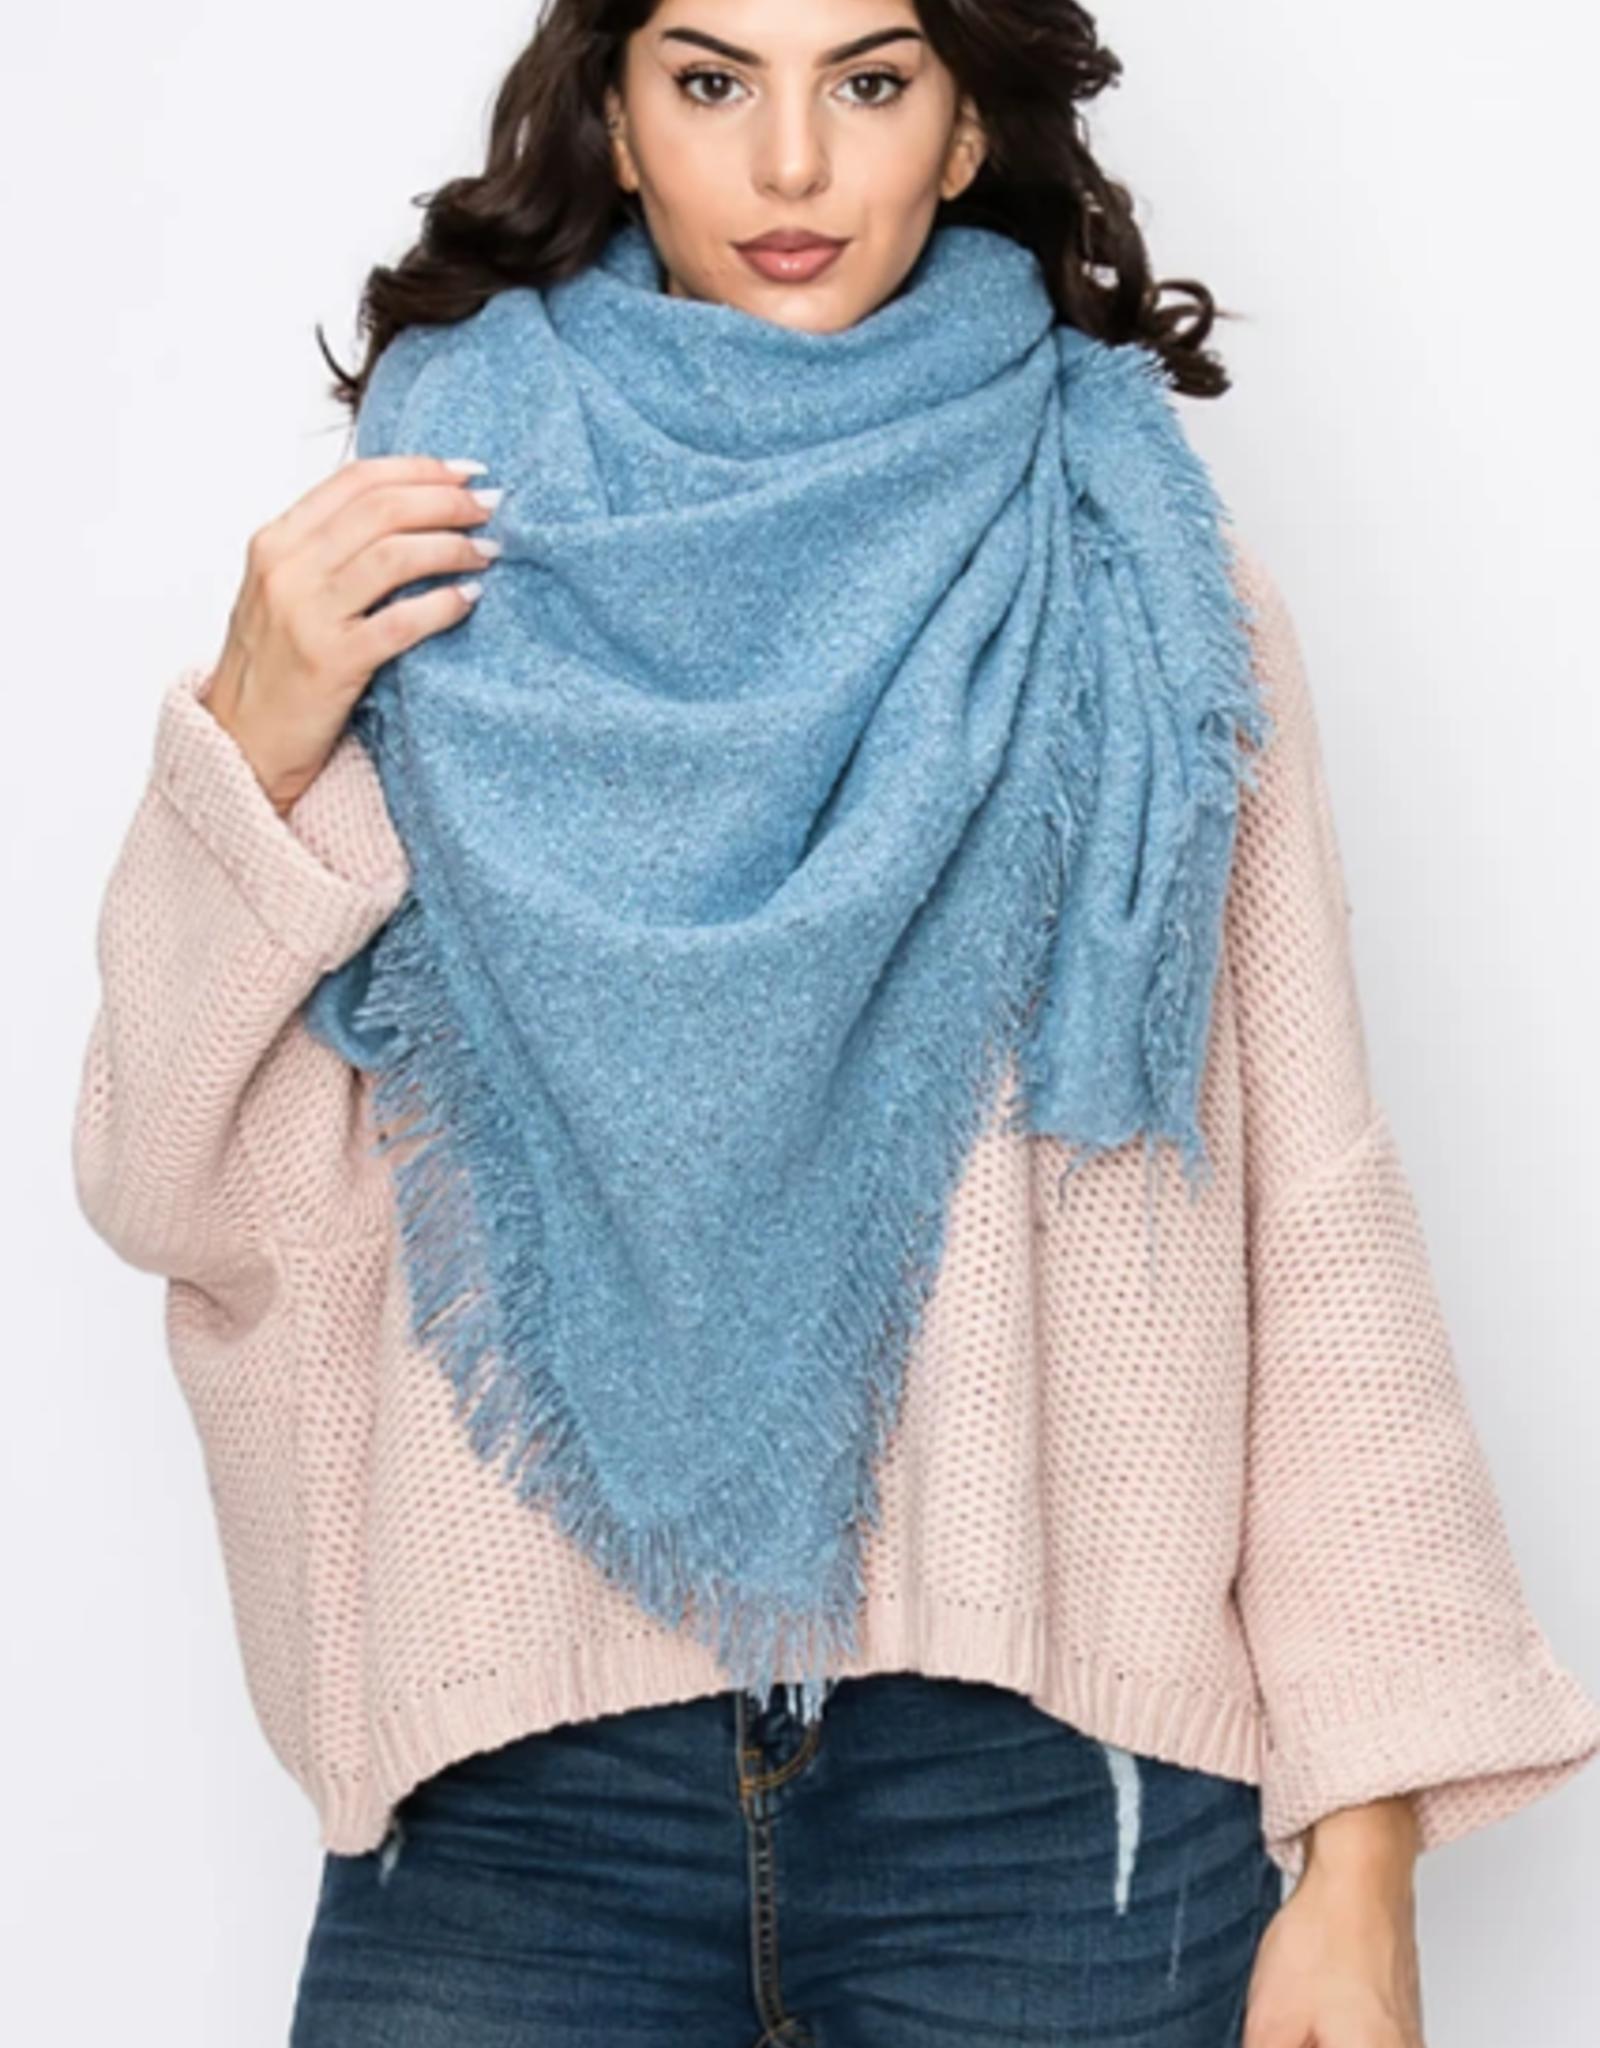 LIB Solid Color Square Blanket Scarf